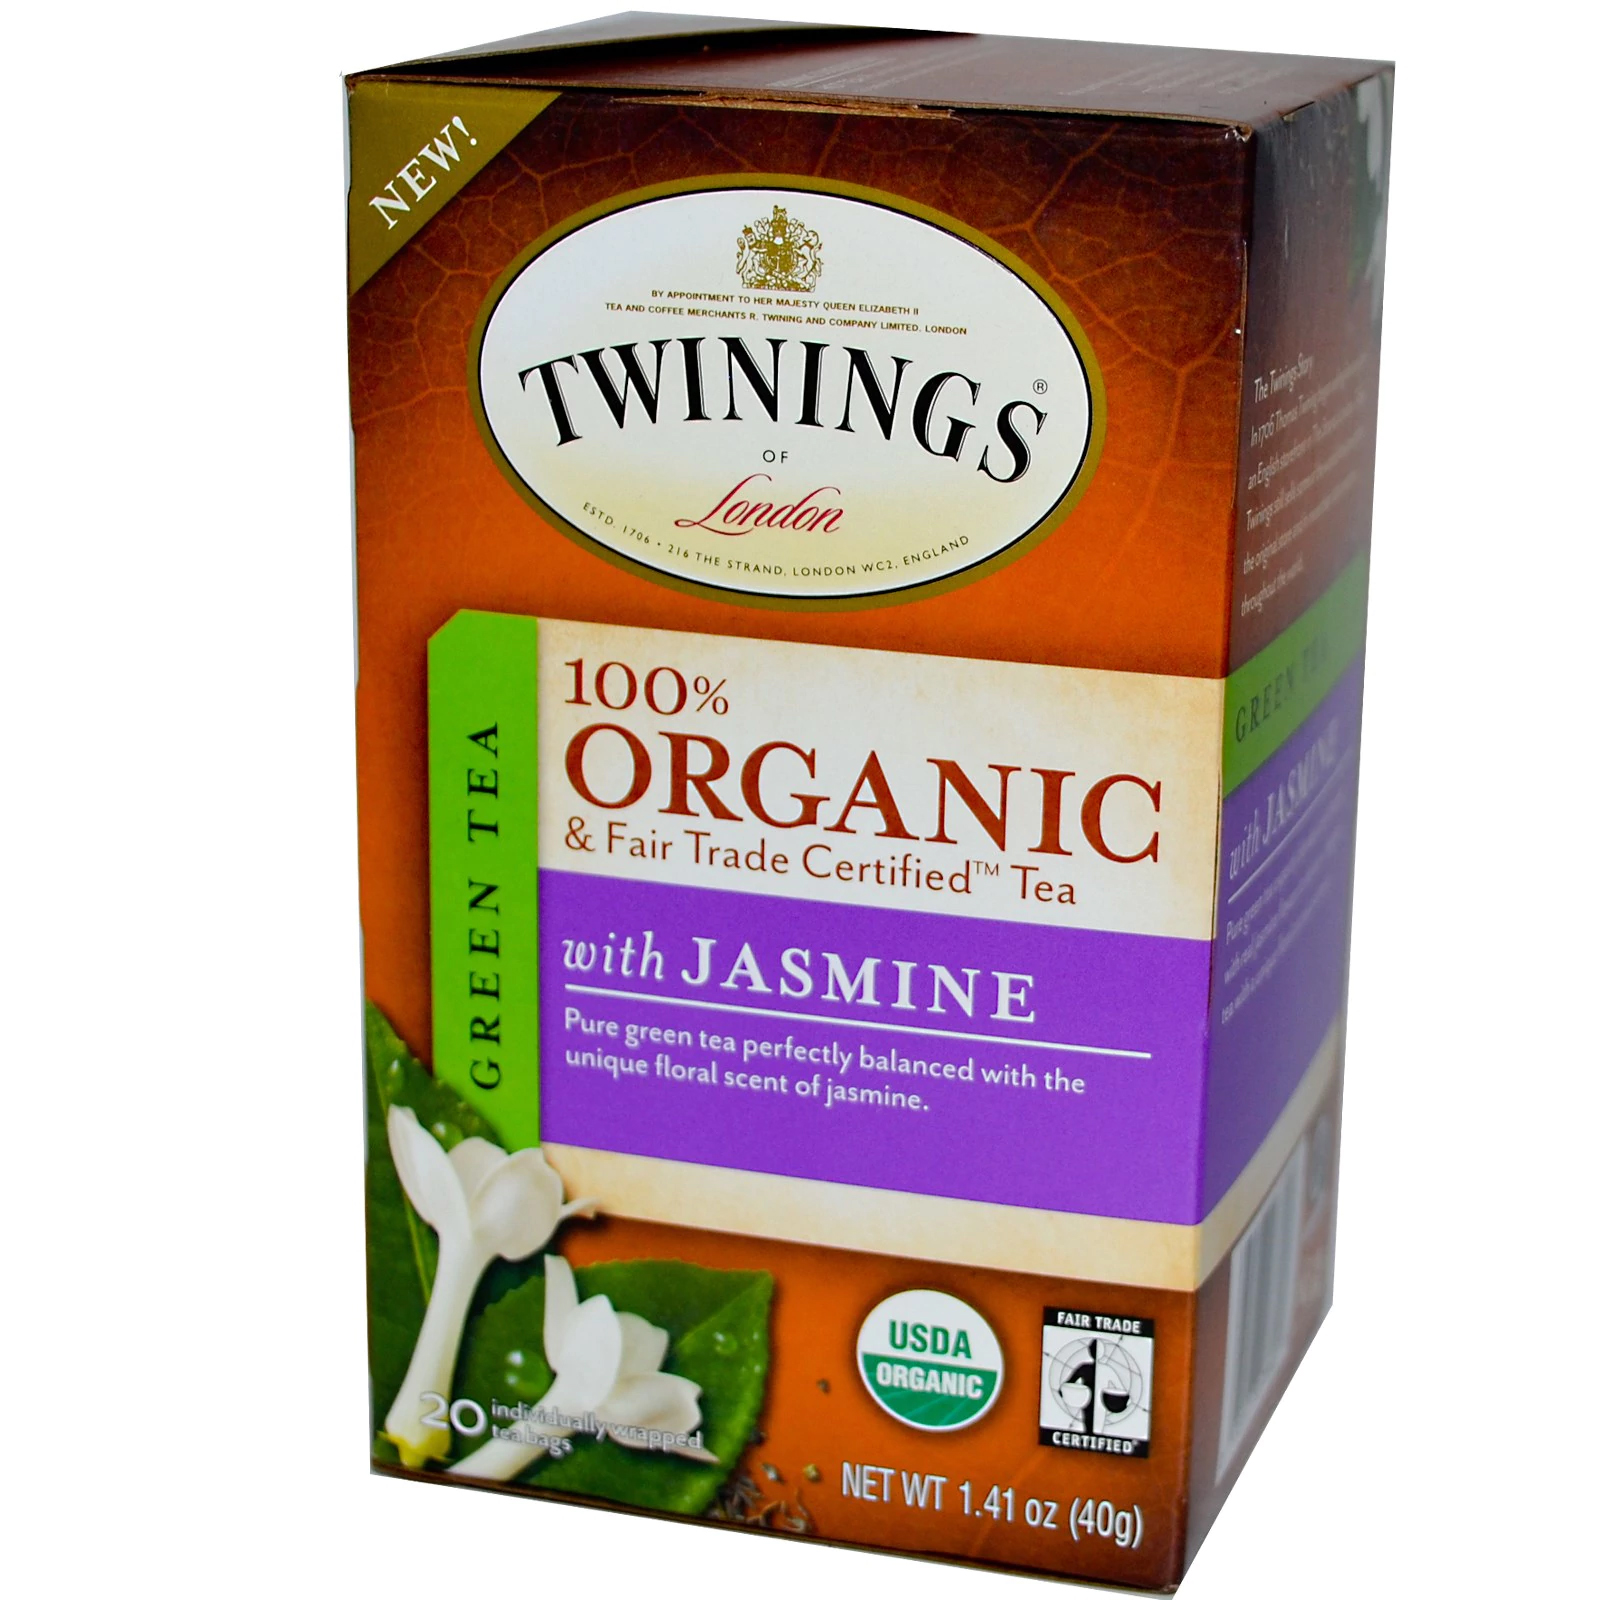 Jasmine Green Organic Tea From Twinings